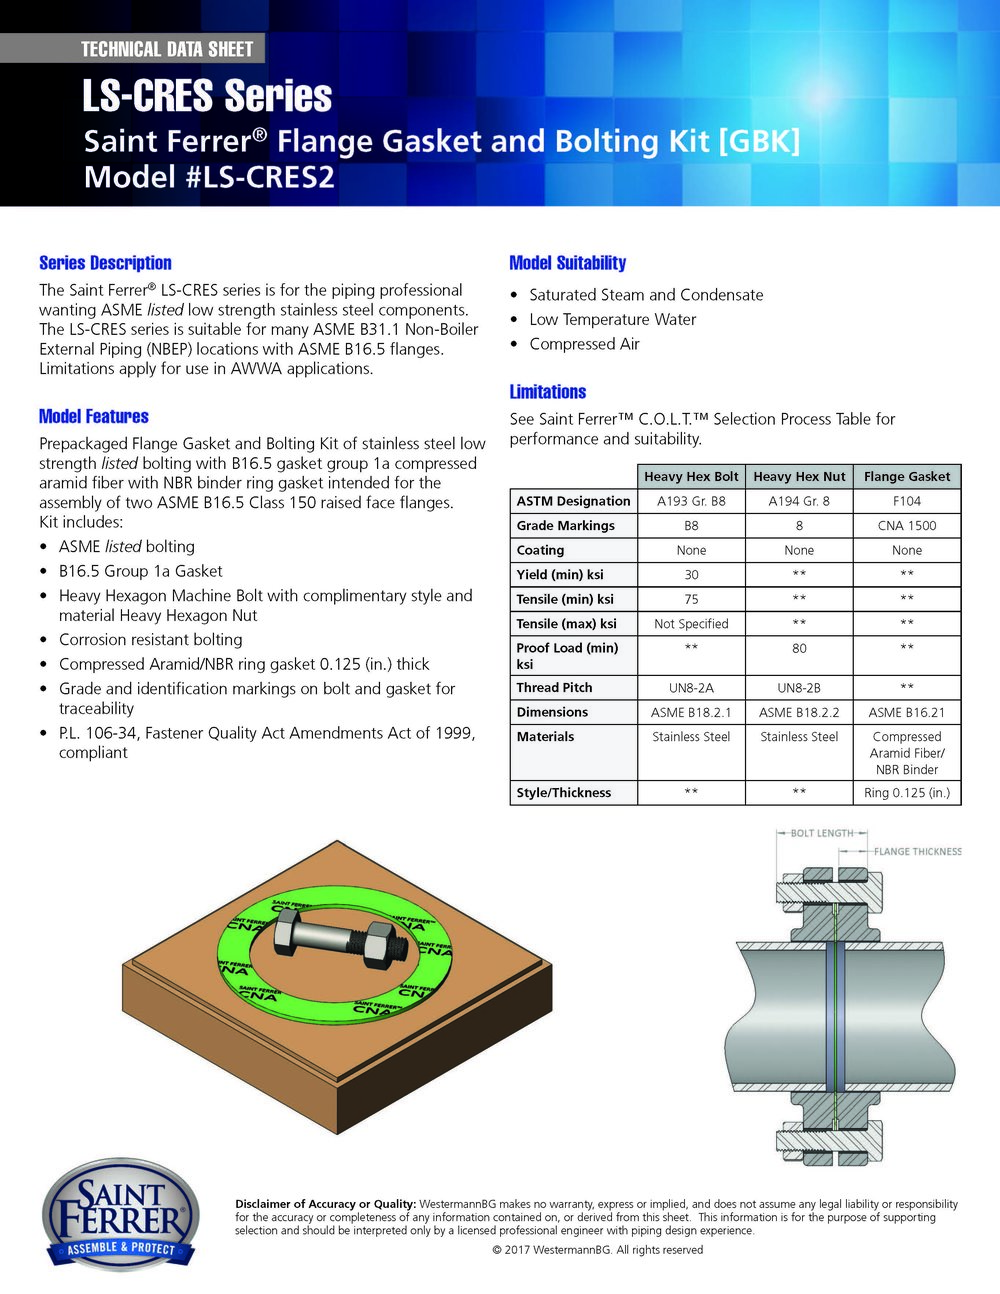 SF_Data_Sheet_LS-CRES_Series_LS-CRES2.jpg